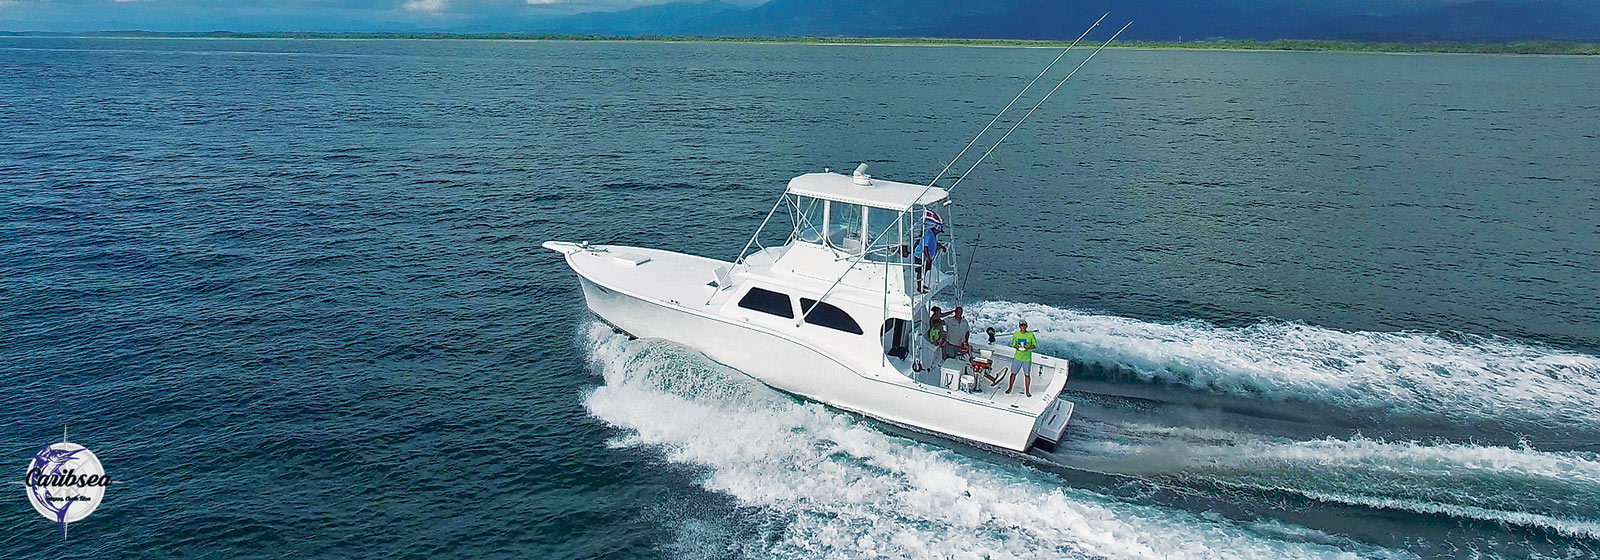 FADs Fishing Costa Rica: caribsea sportfishing charter